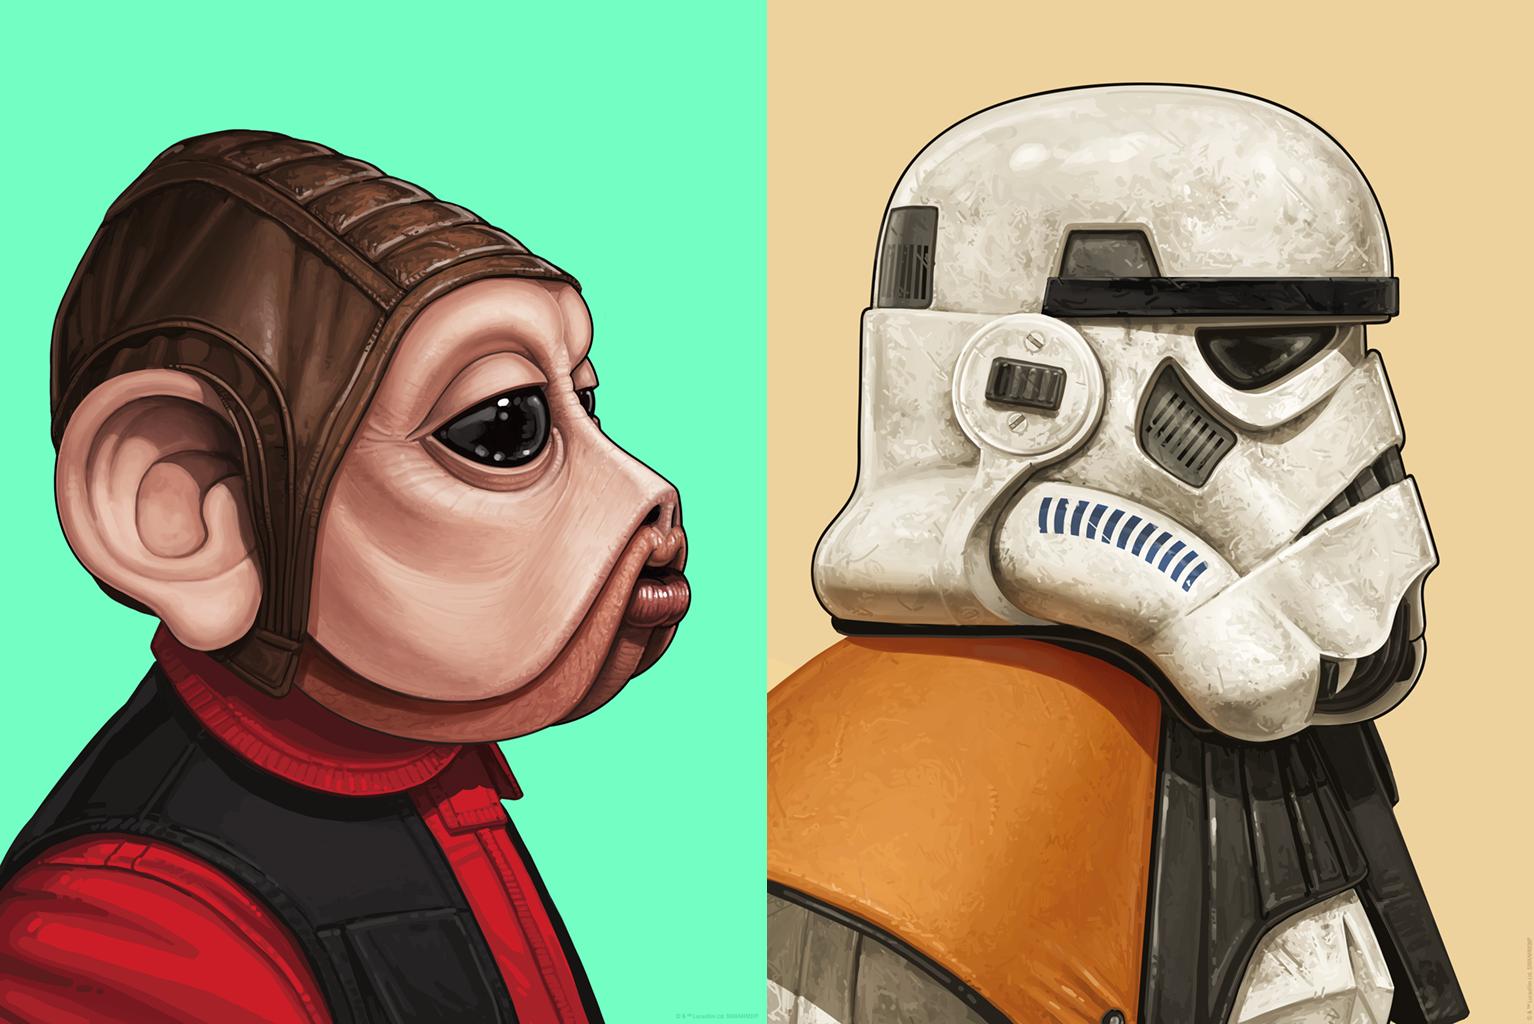 promo code 115b8 b9729 Star Wars Nien Nunb   Sandtrooper Portrait Prints by Mike Mitchell x Mondo